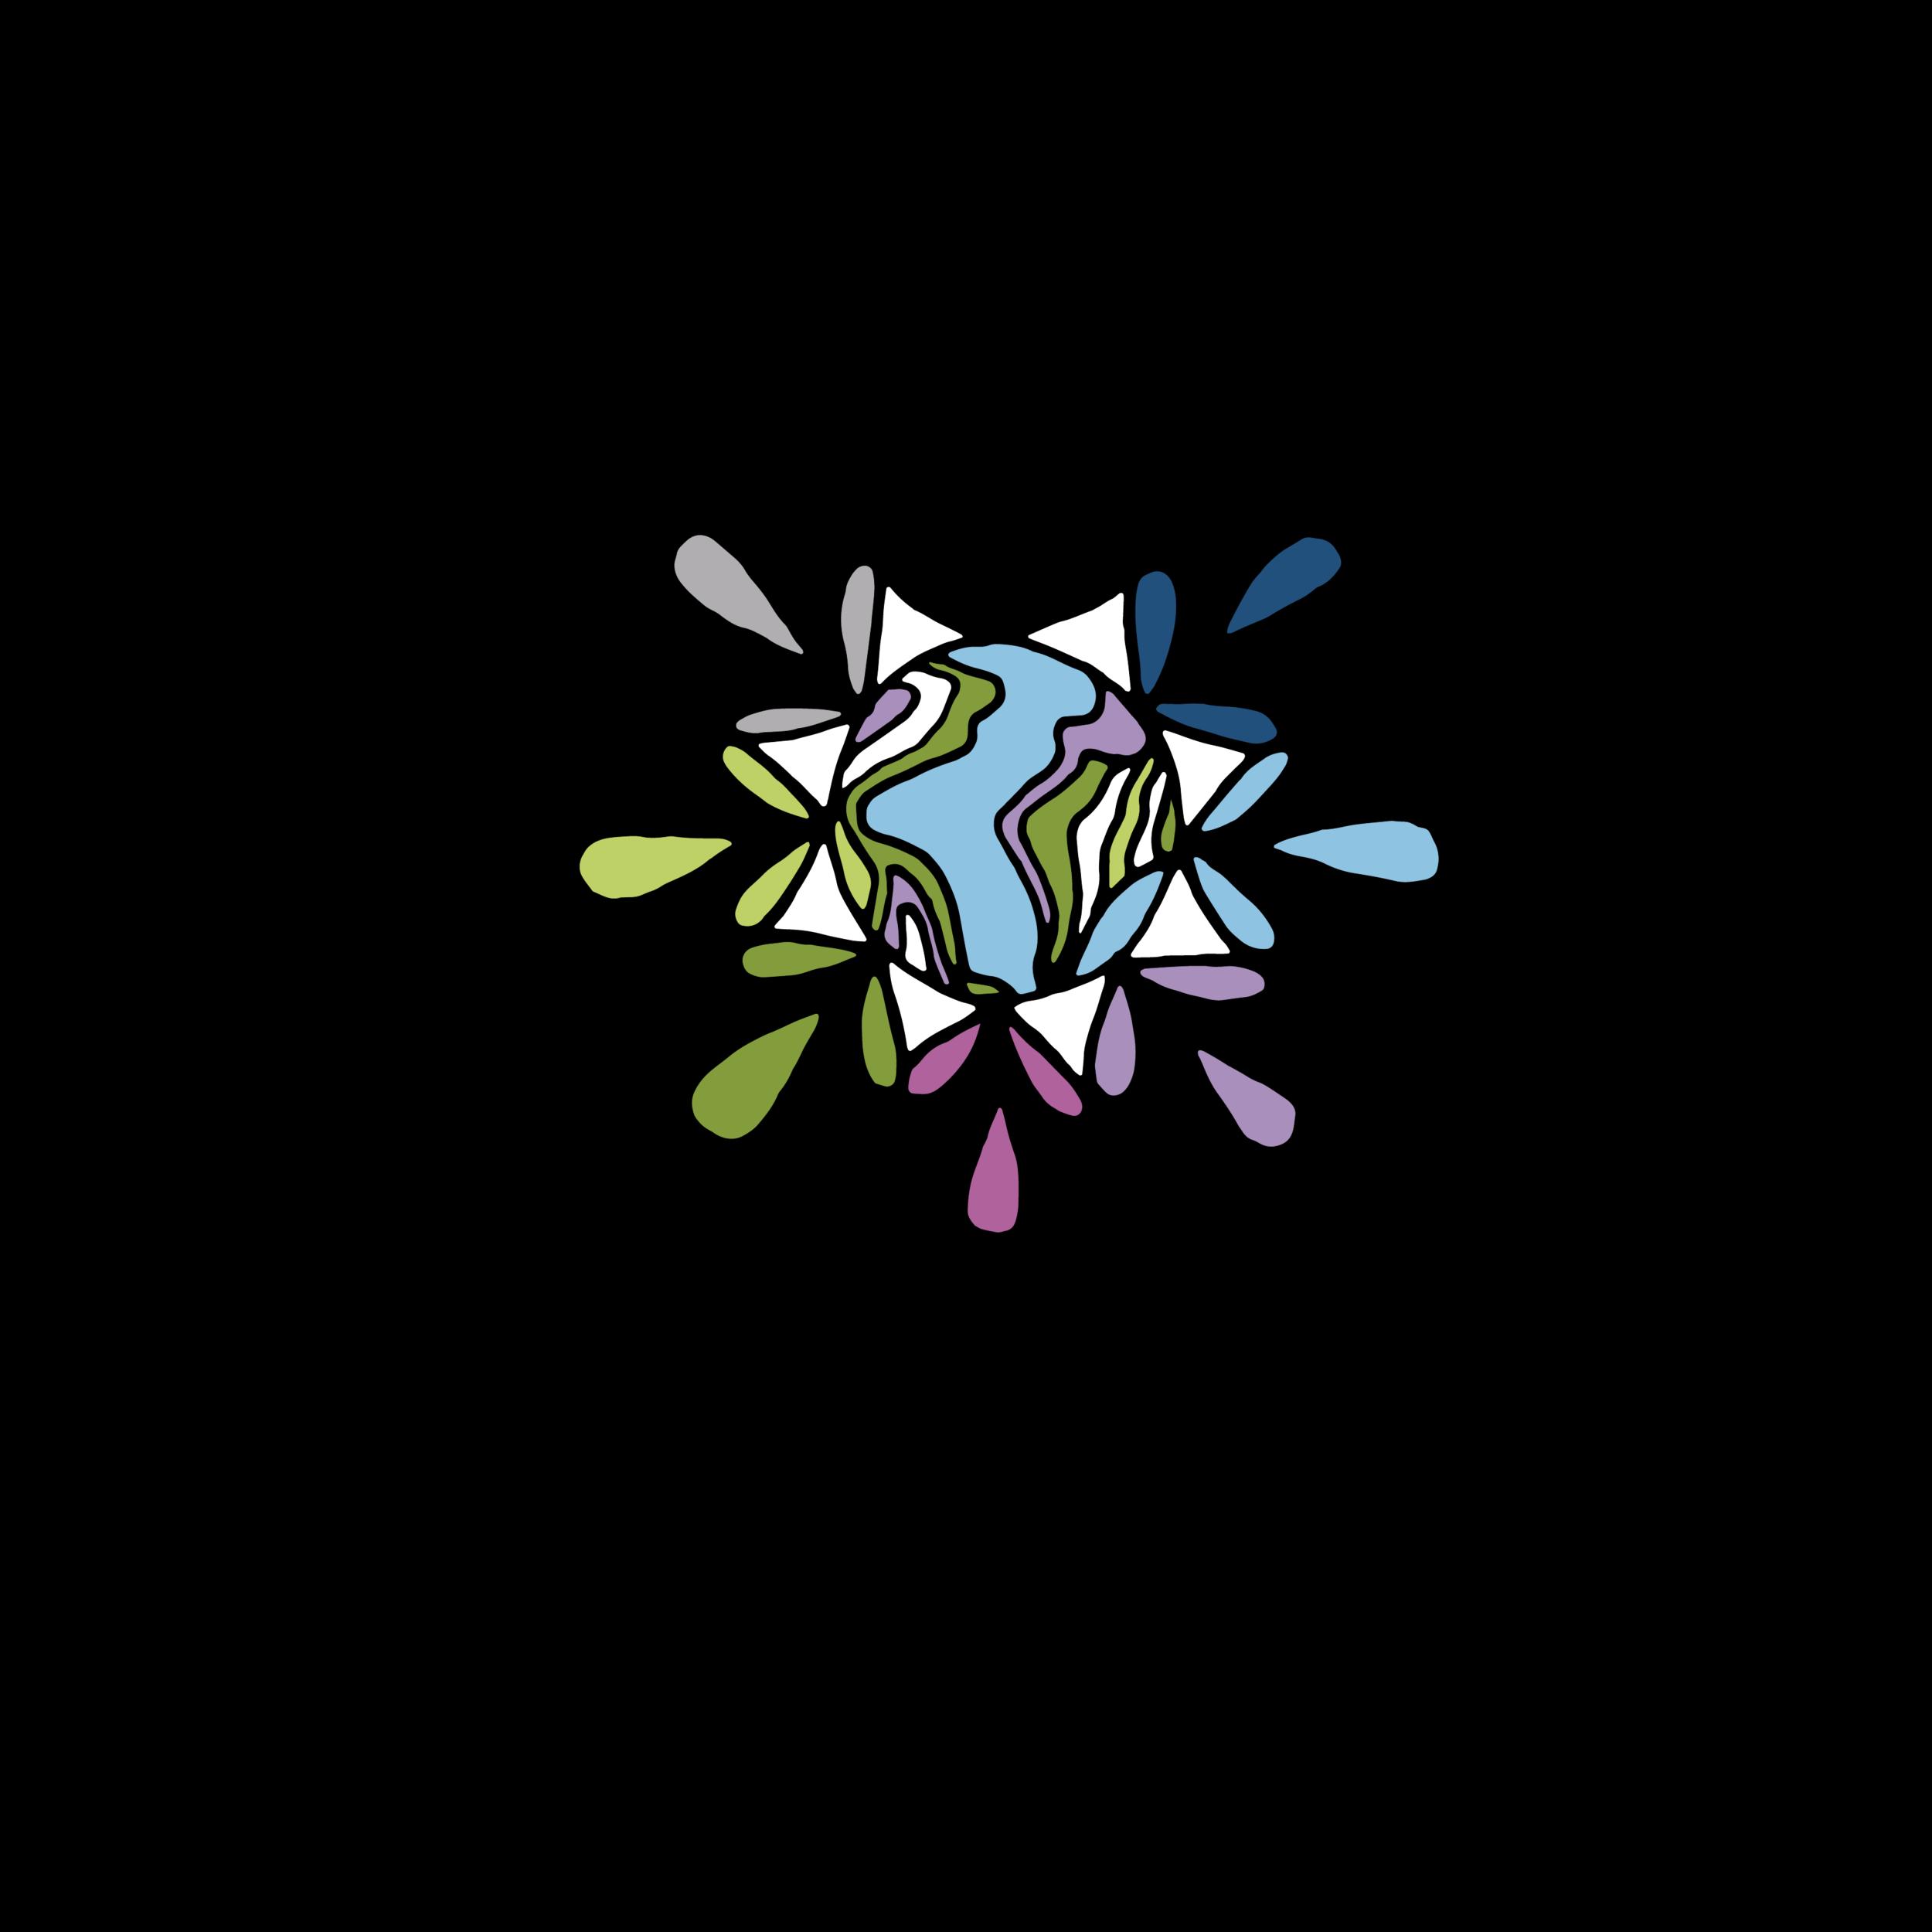 lola-final-illustration-web.jpg